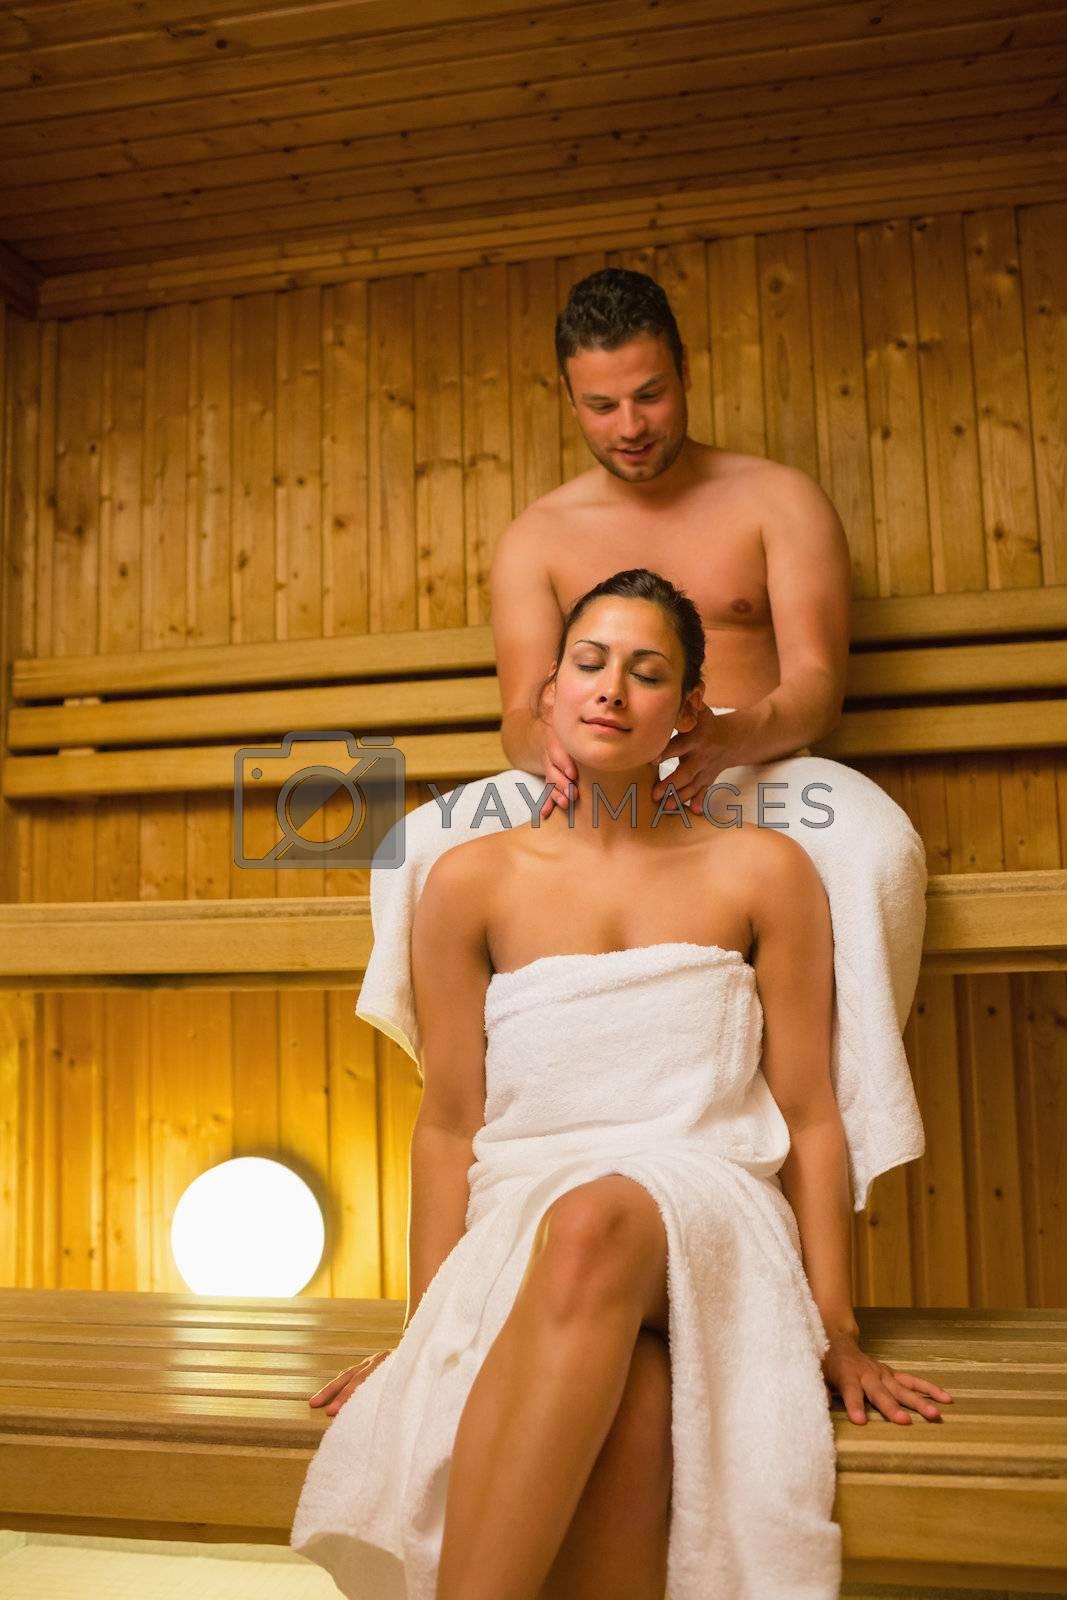 Man giving his girlfriend a neck massage in sauna by Wavebreakmedia